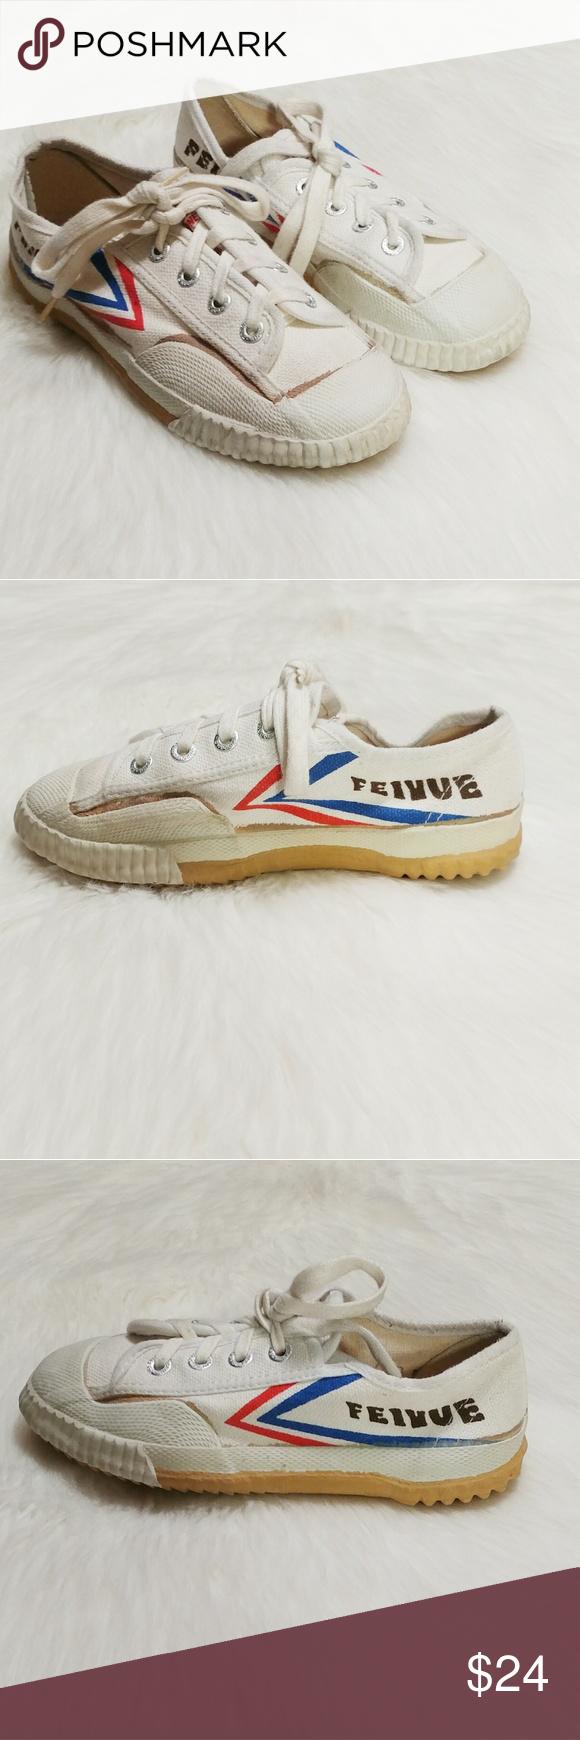 Madewell Feiyue Sneakers | Madewell